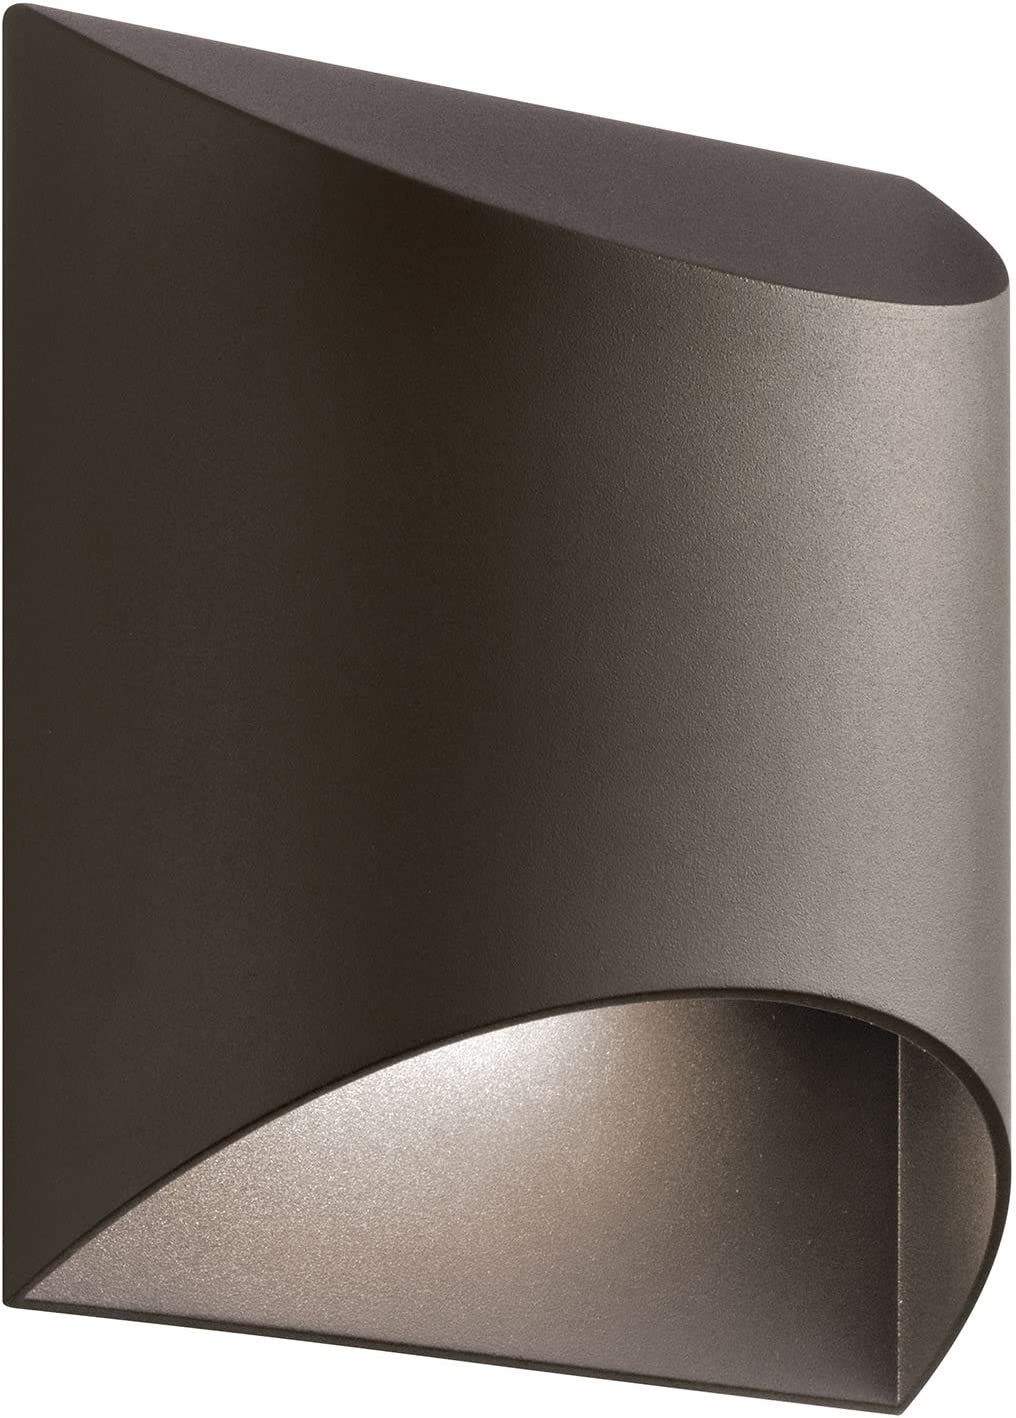 Kichler 49278AZTLED, Wesly Cast Aluminum Outdoor Wall Sconce Lighting LED, Bronze